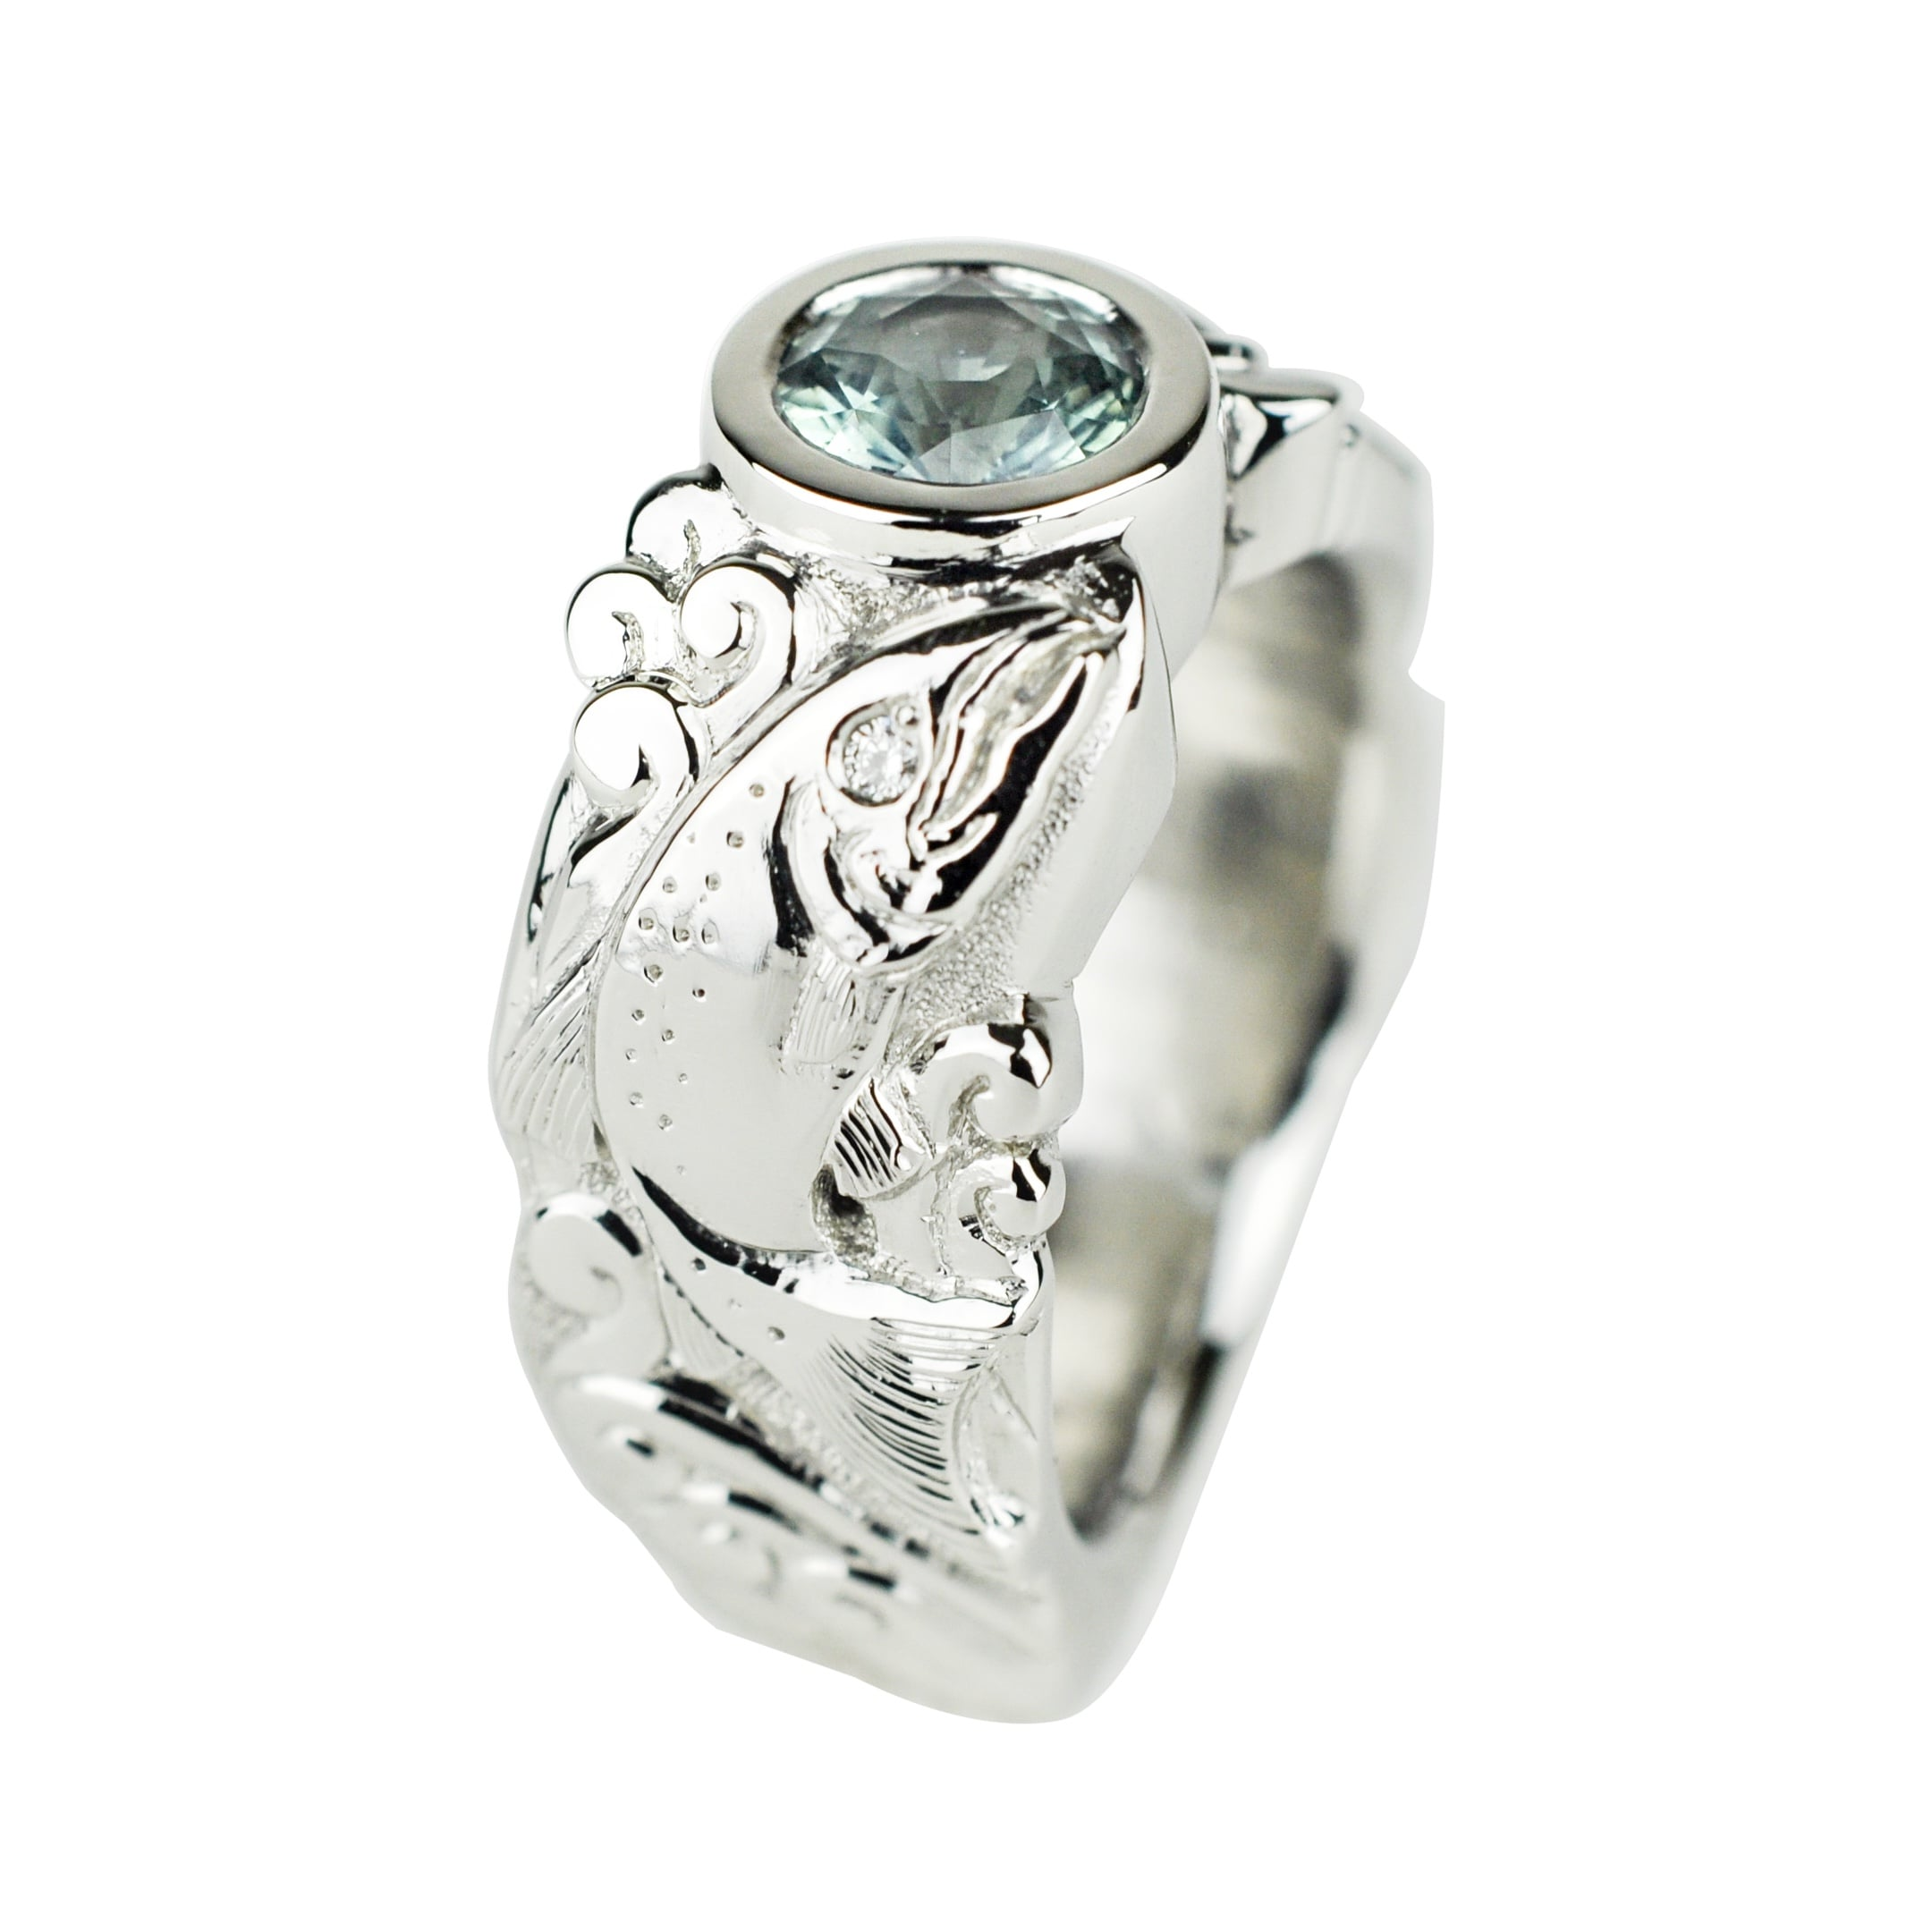 Platinum Salmon Ring with Montana Sapphire and Diamonds